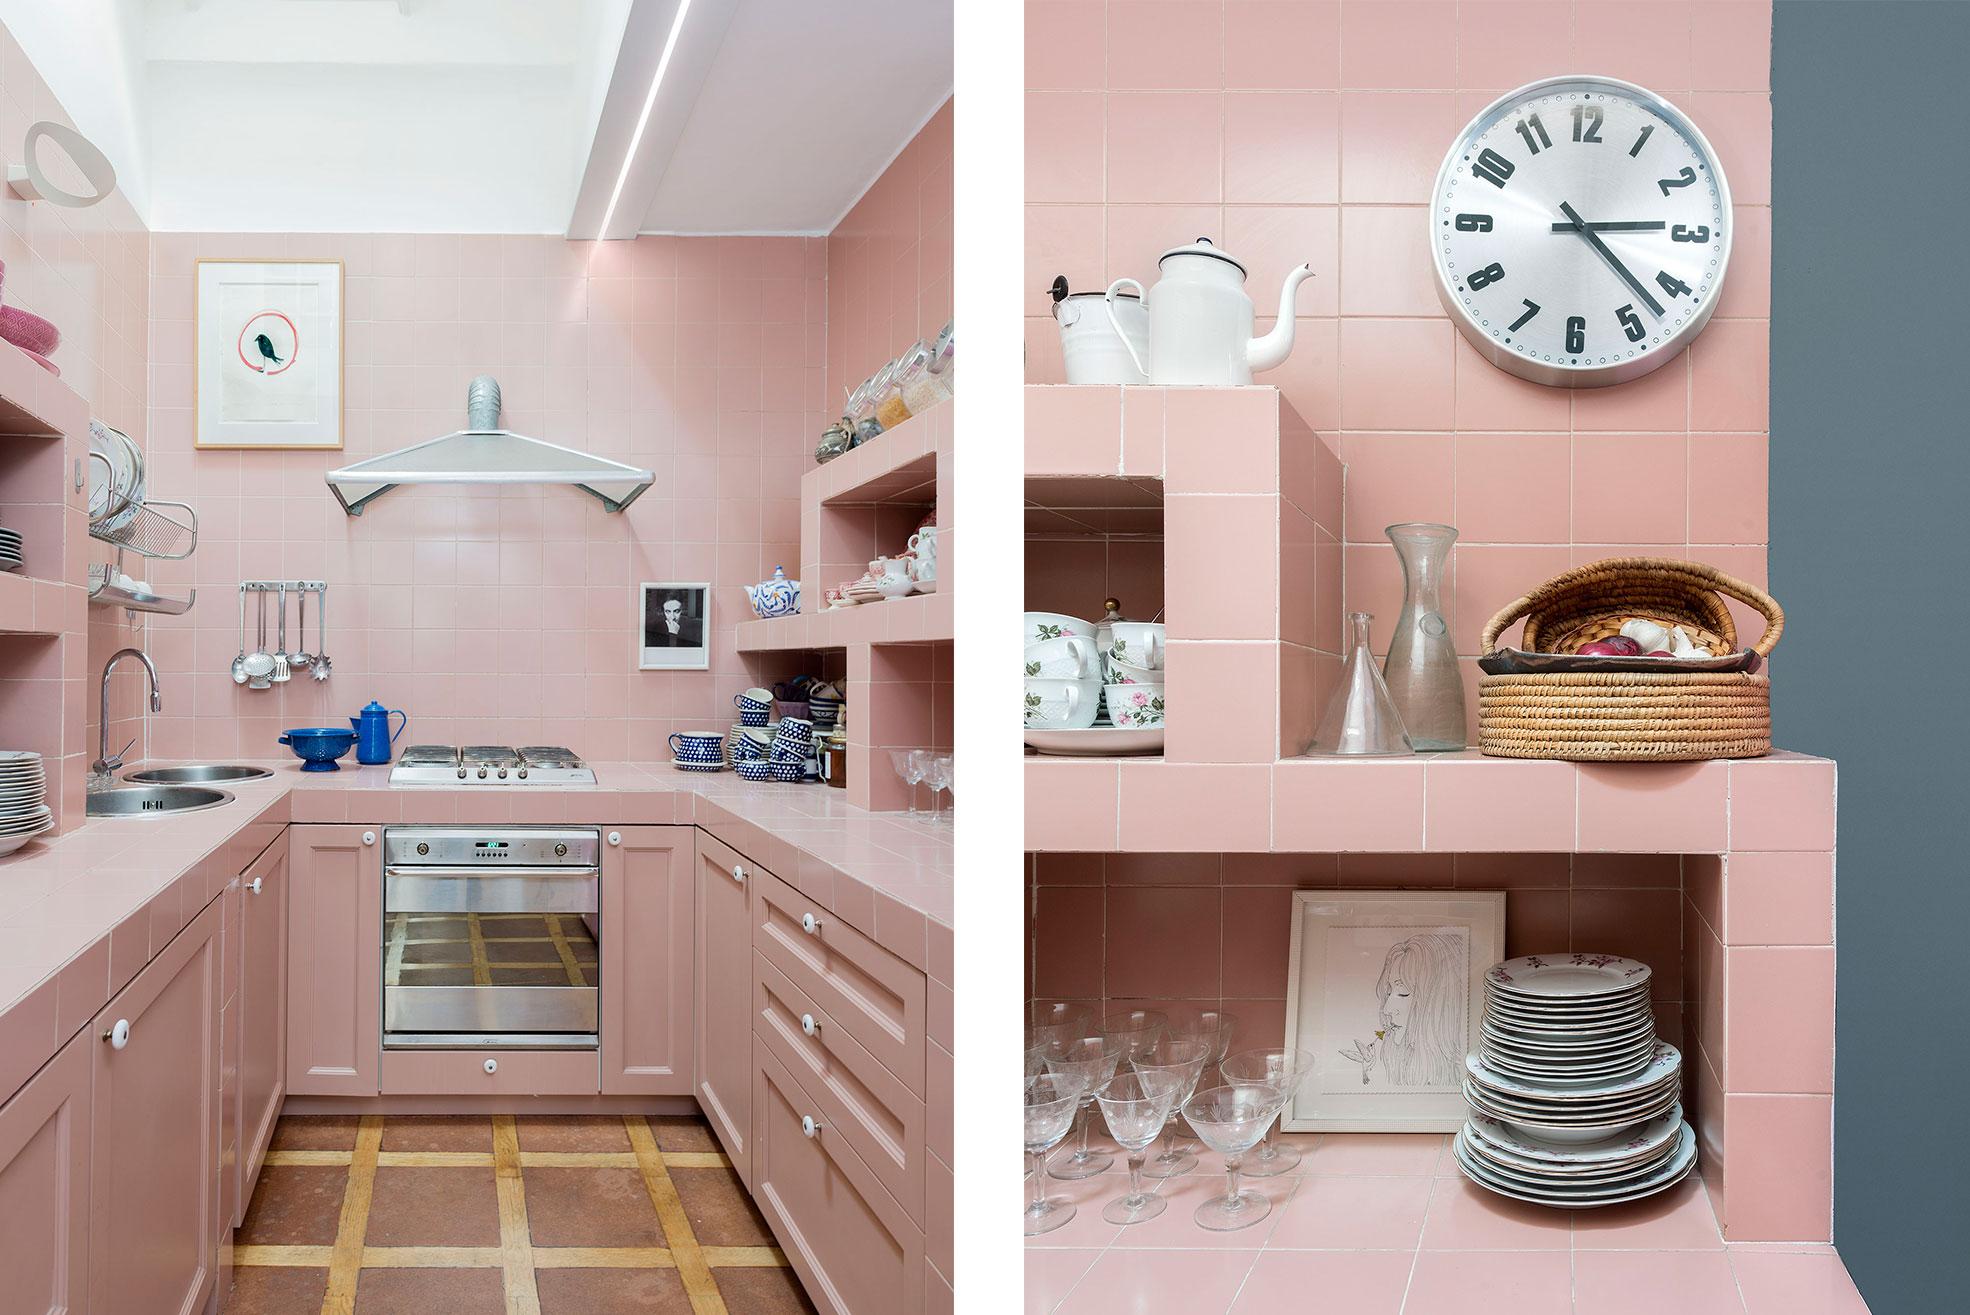 Kitchen of Federica Fracassi's Home Photographer Maria Teresa Furnari